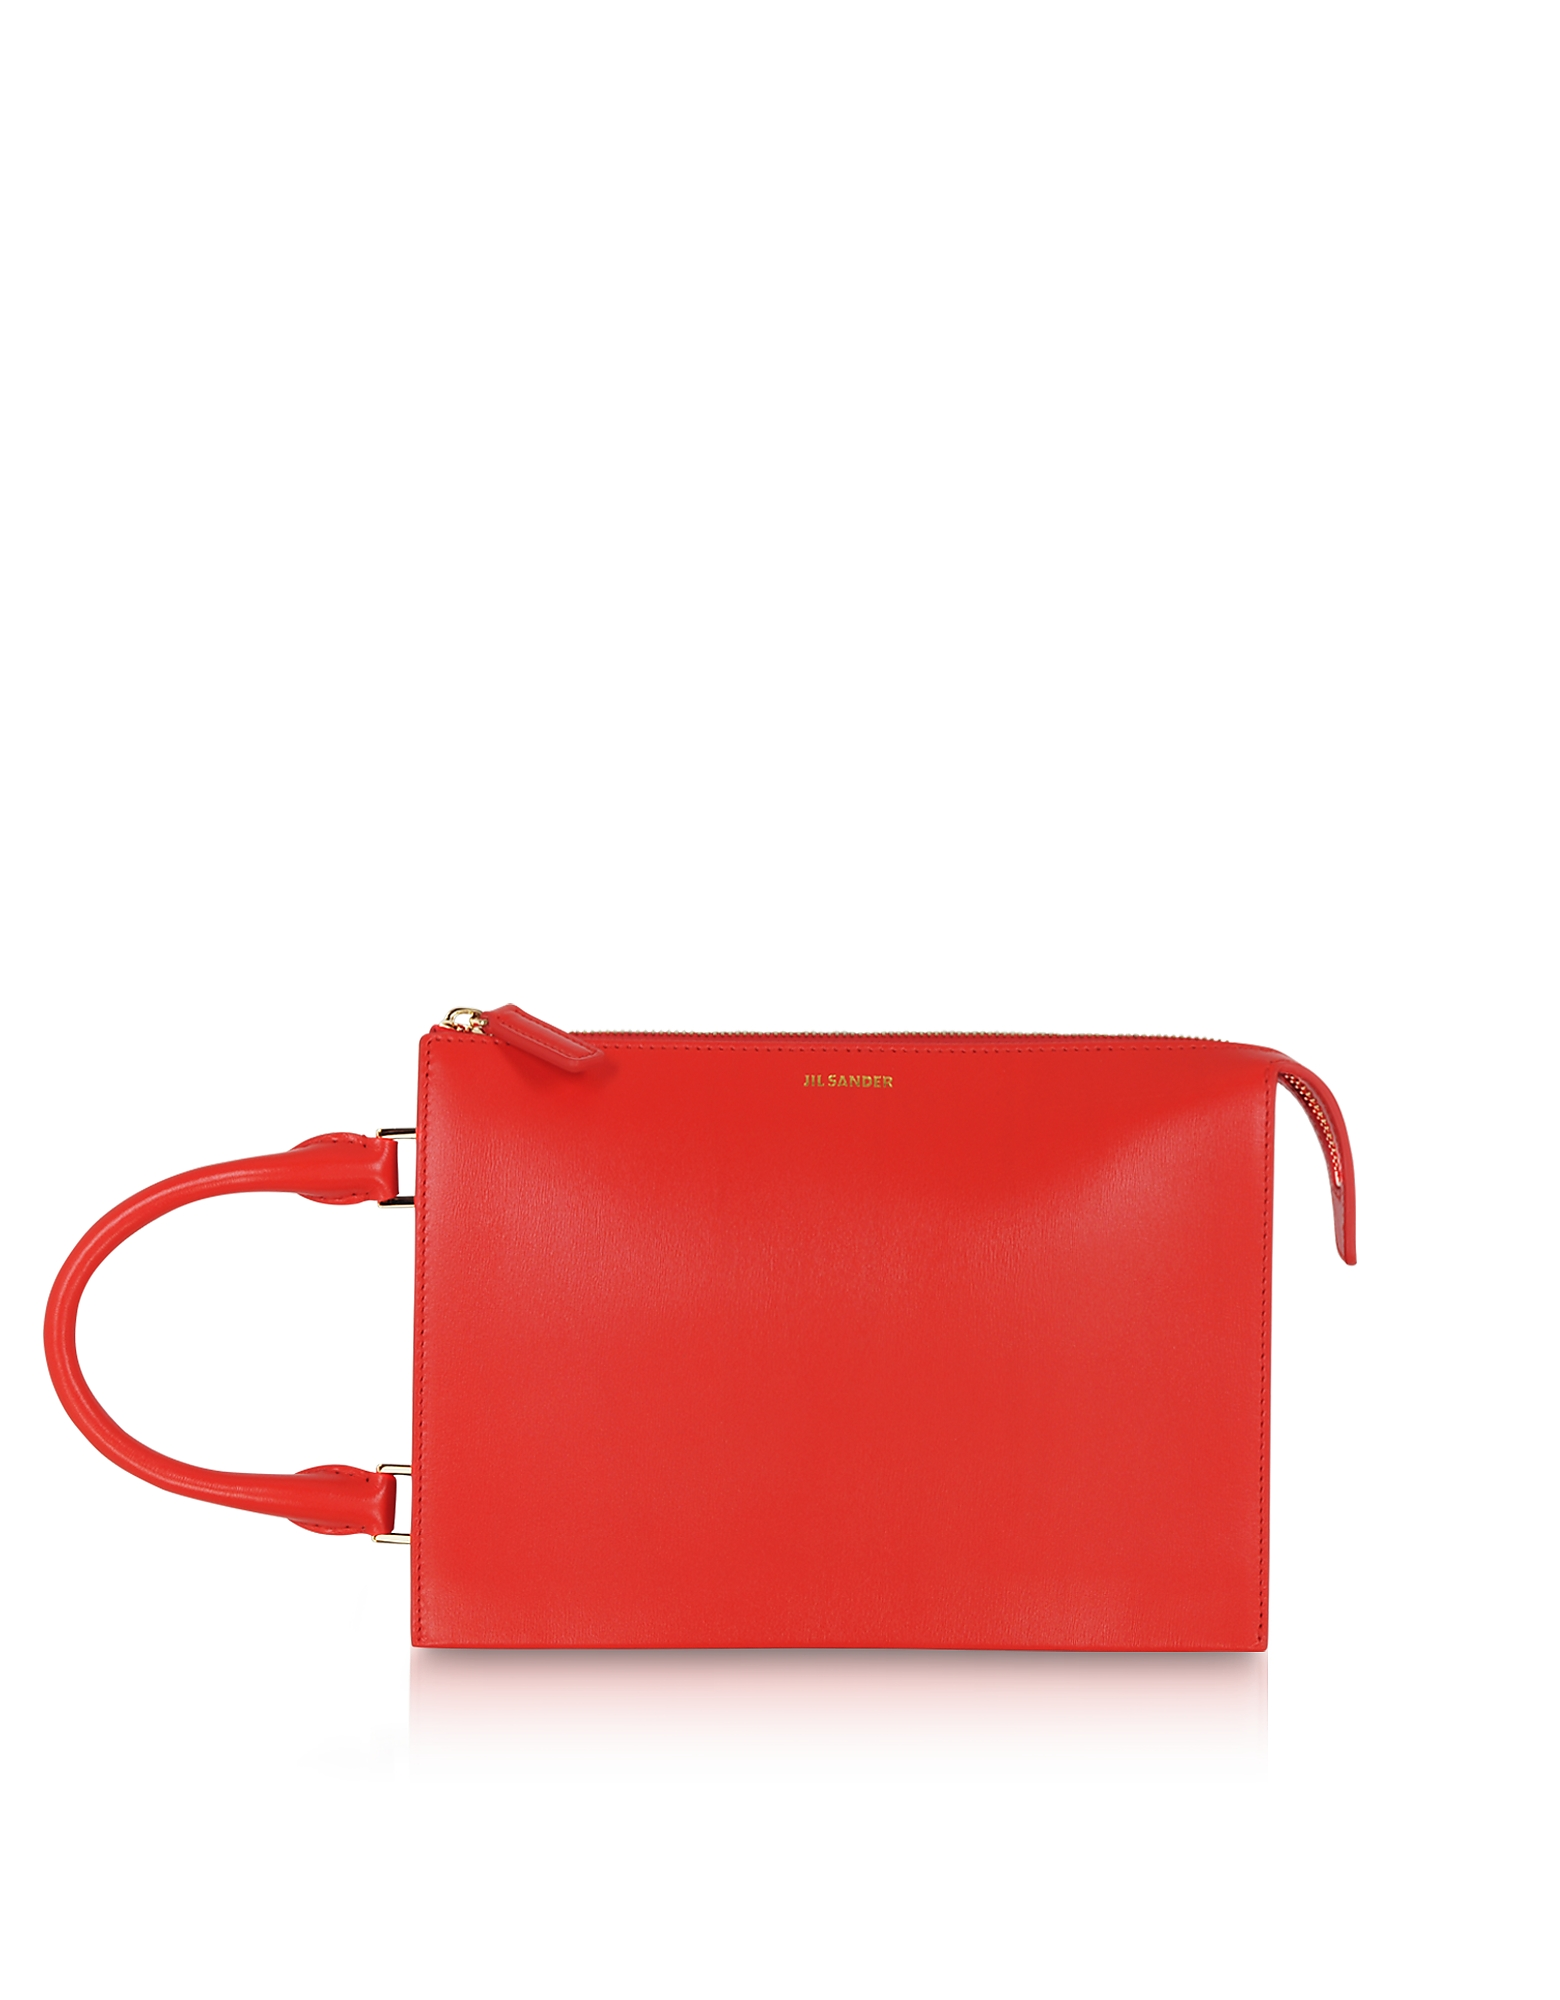 Image of Jil Sander Designer Handbags, Tootie Small Knitted Leather Handbag